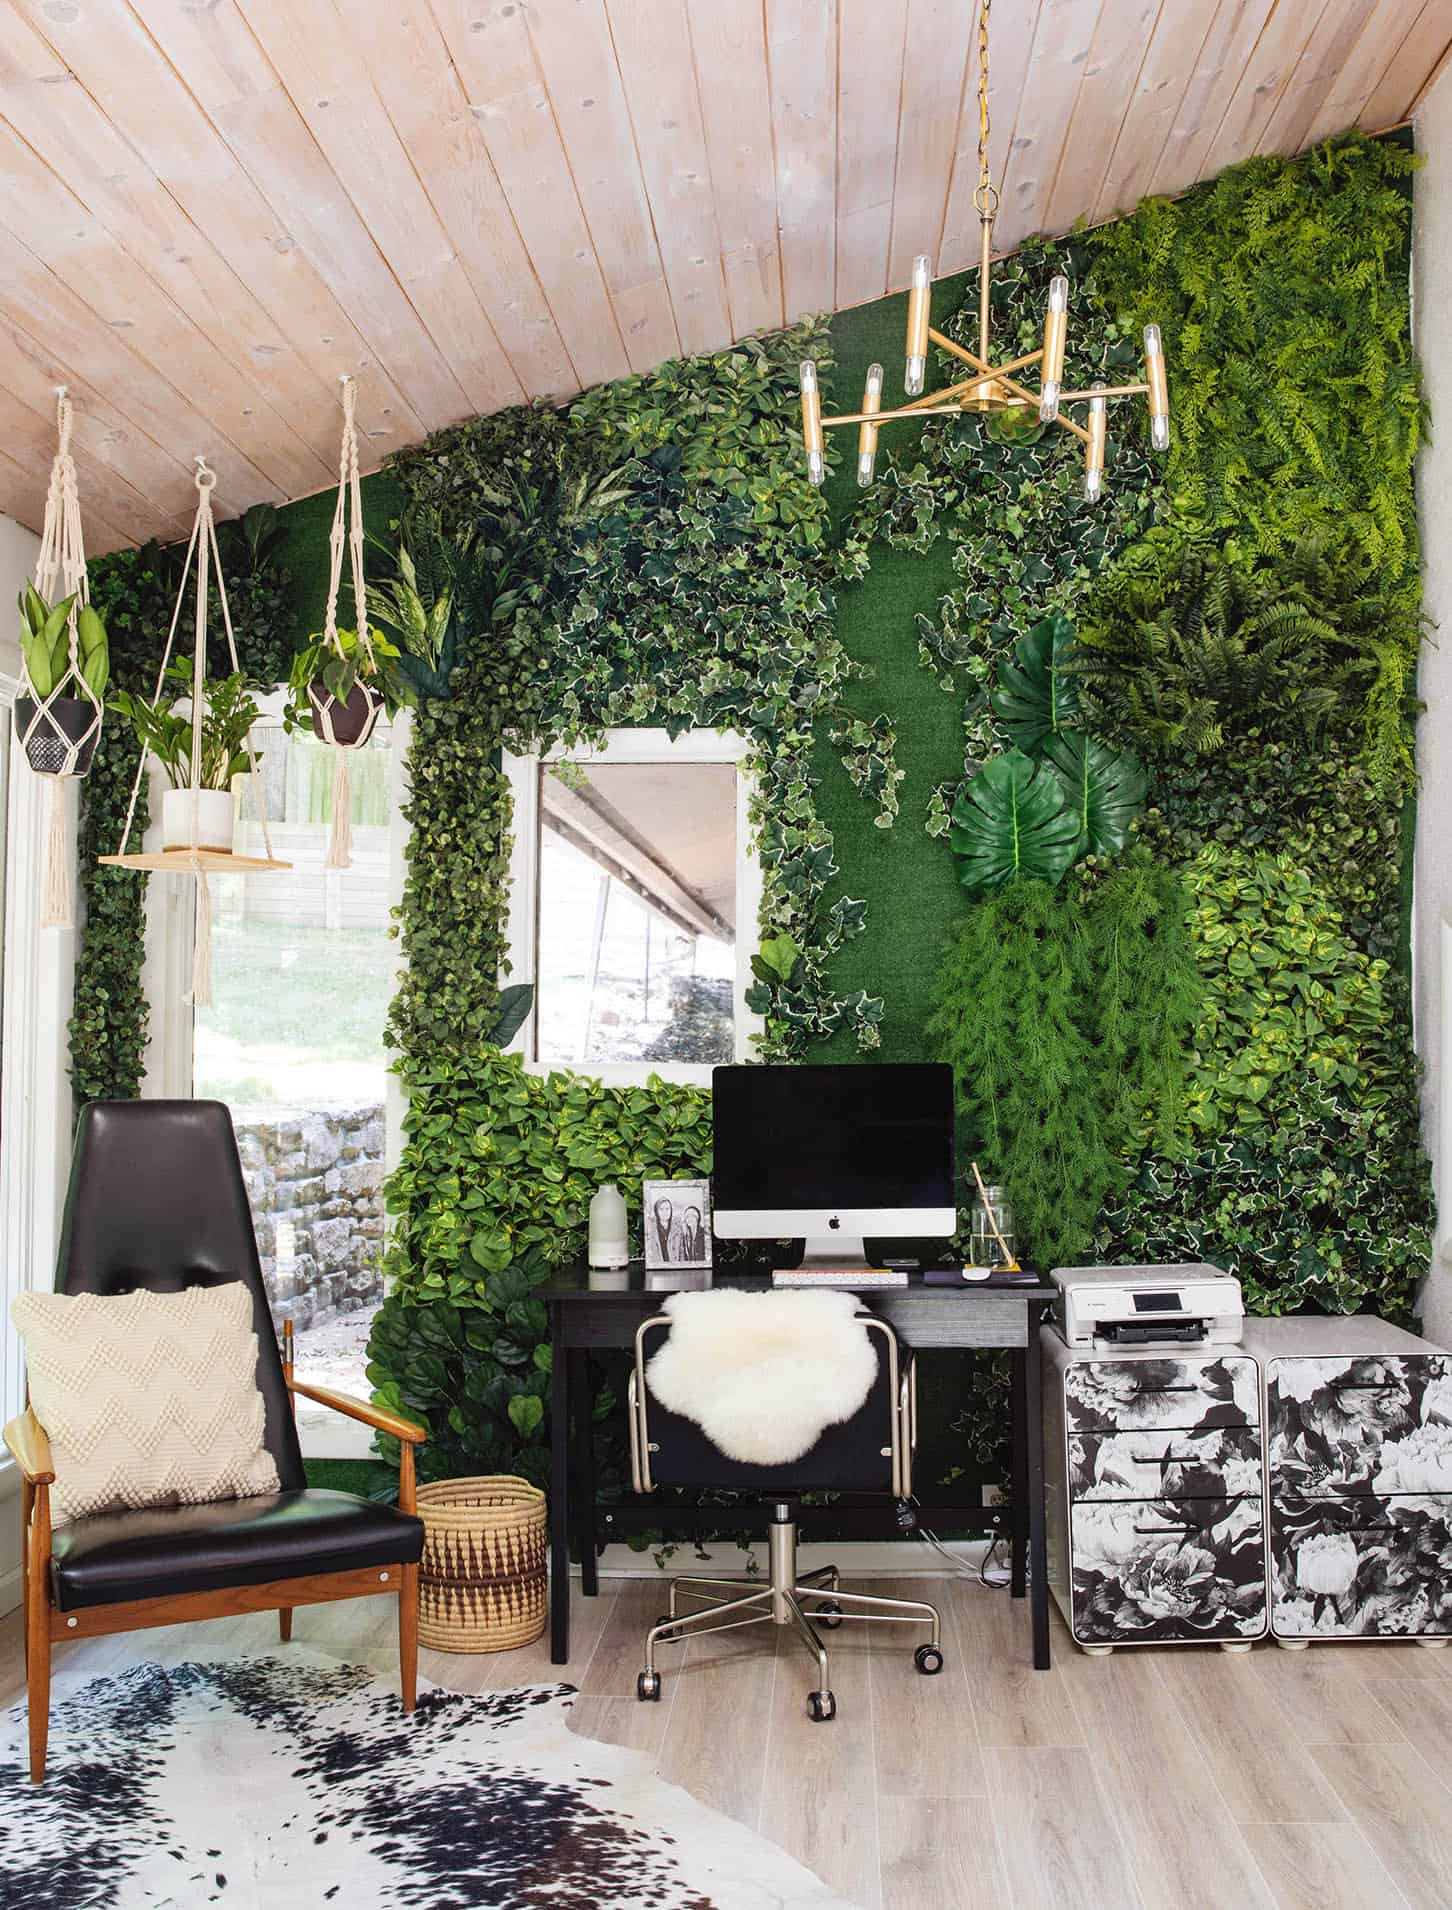 DIY Faux Living Wall